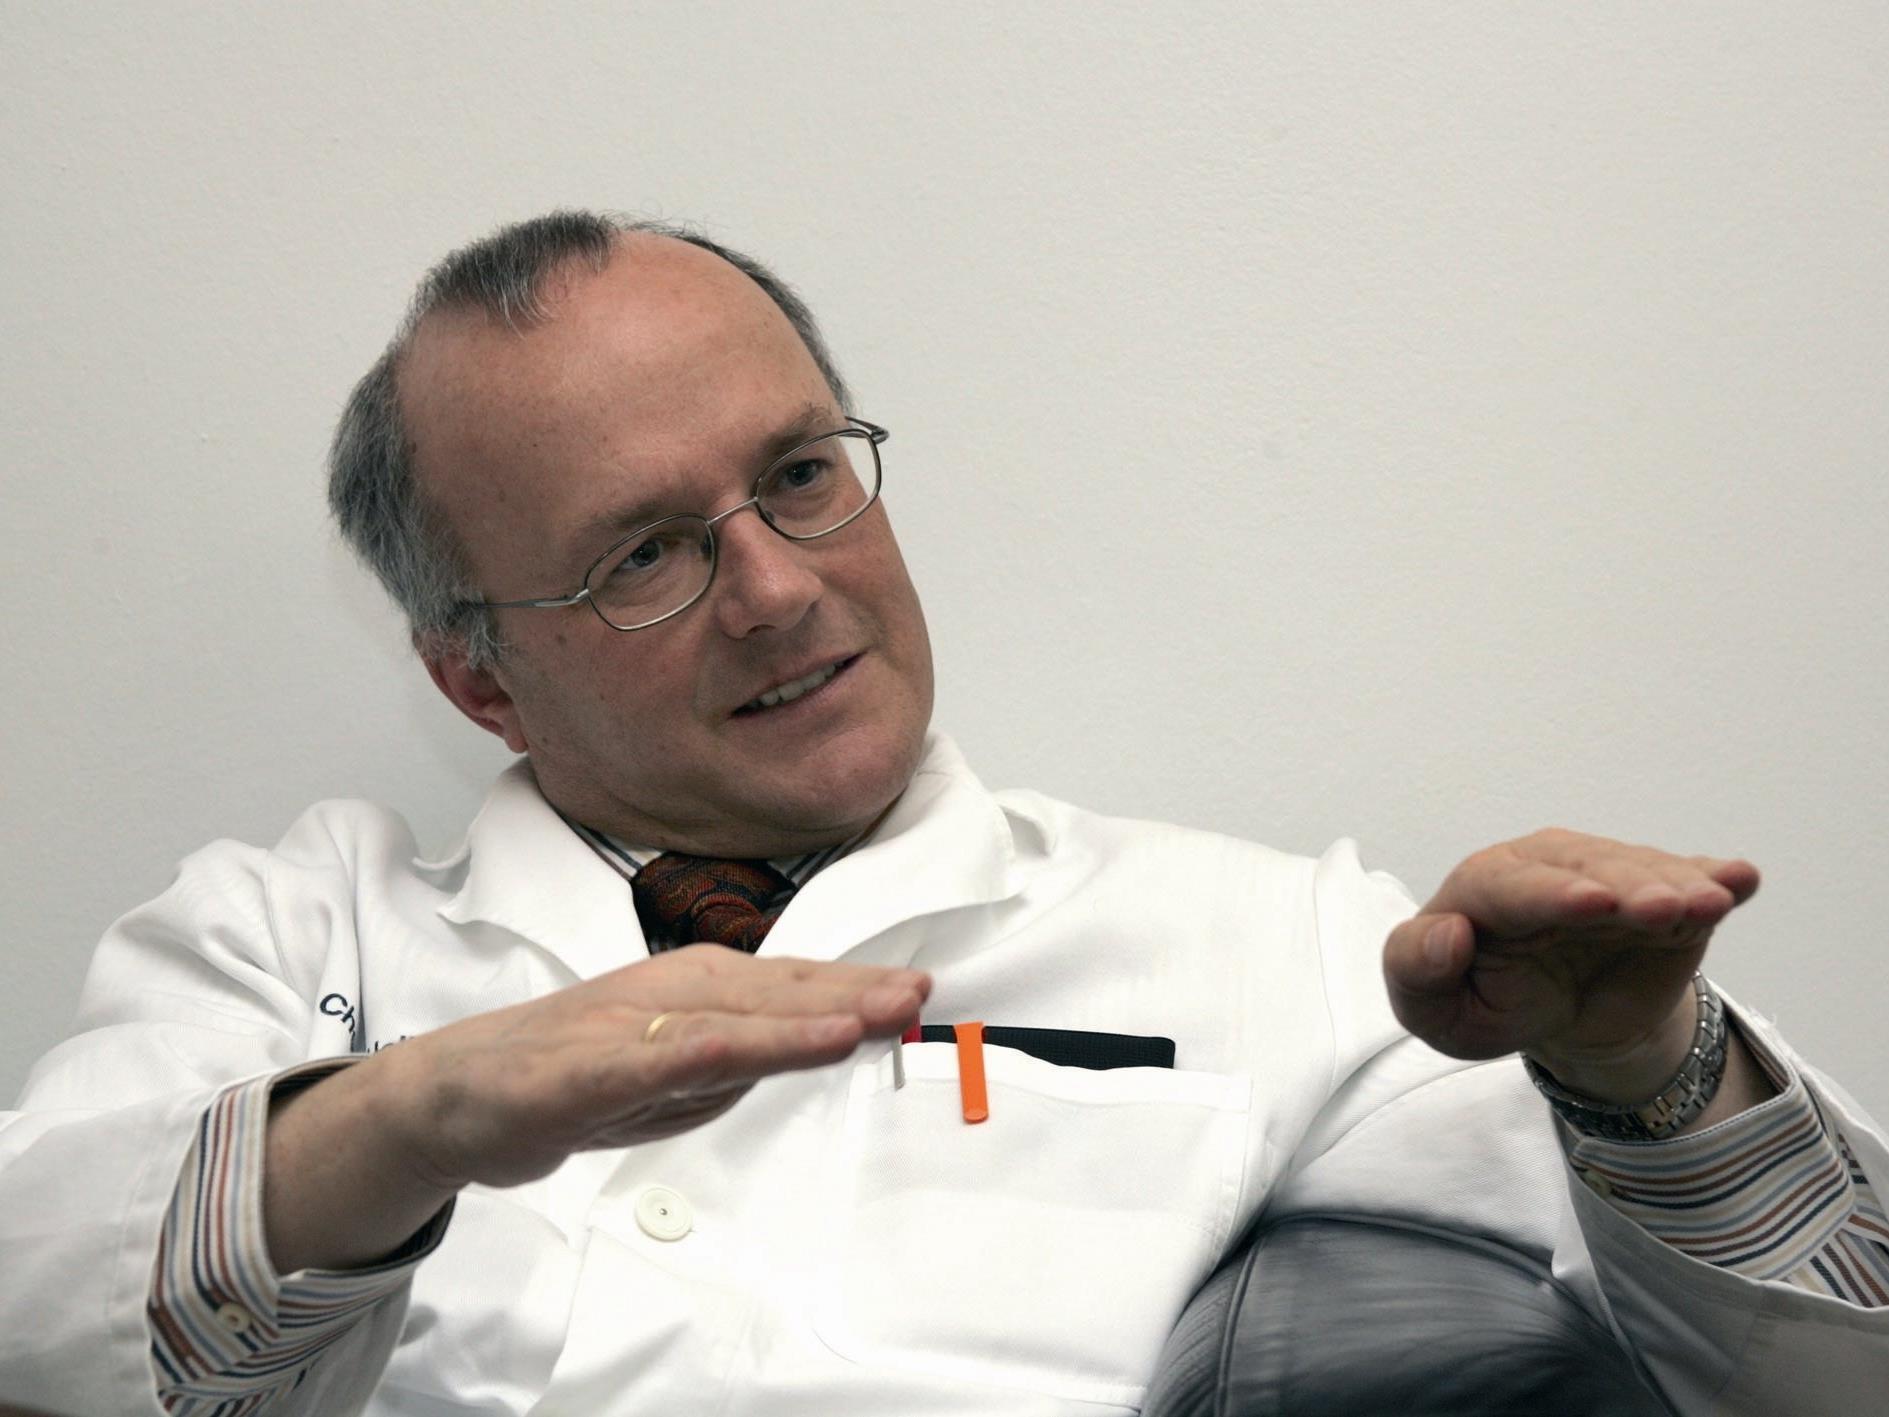 Prof. Dr. Reinhard Haller